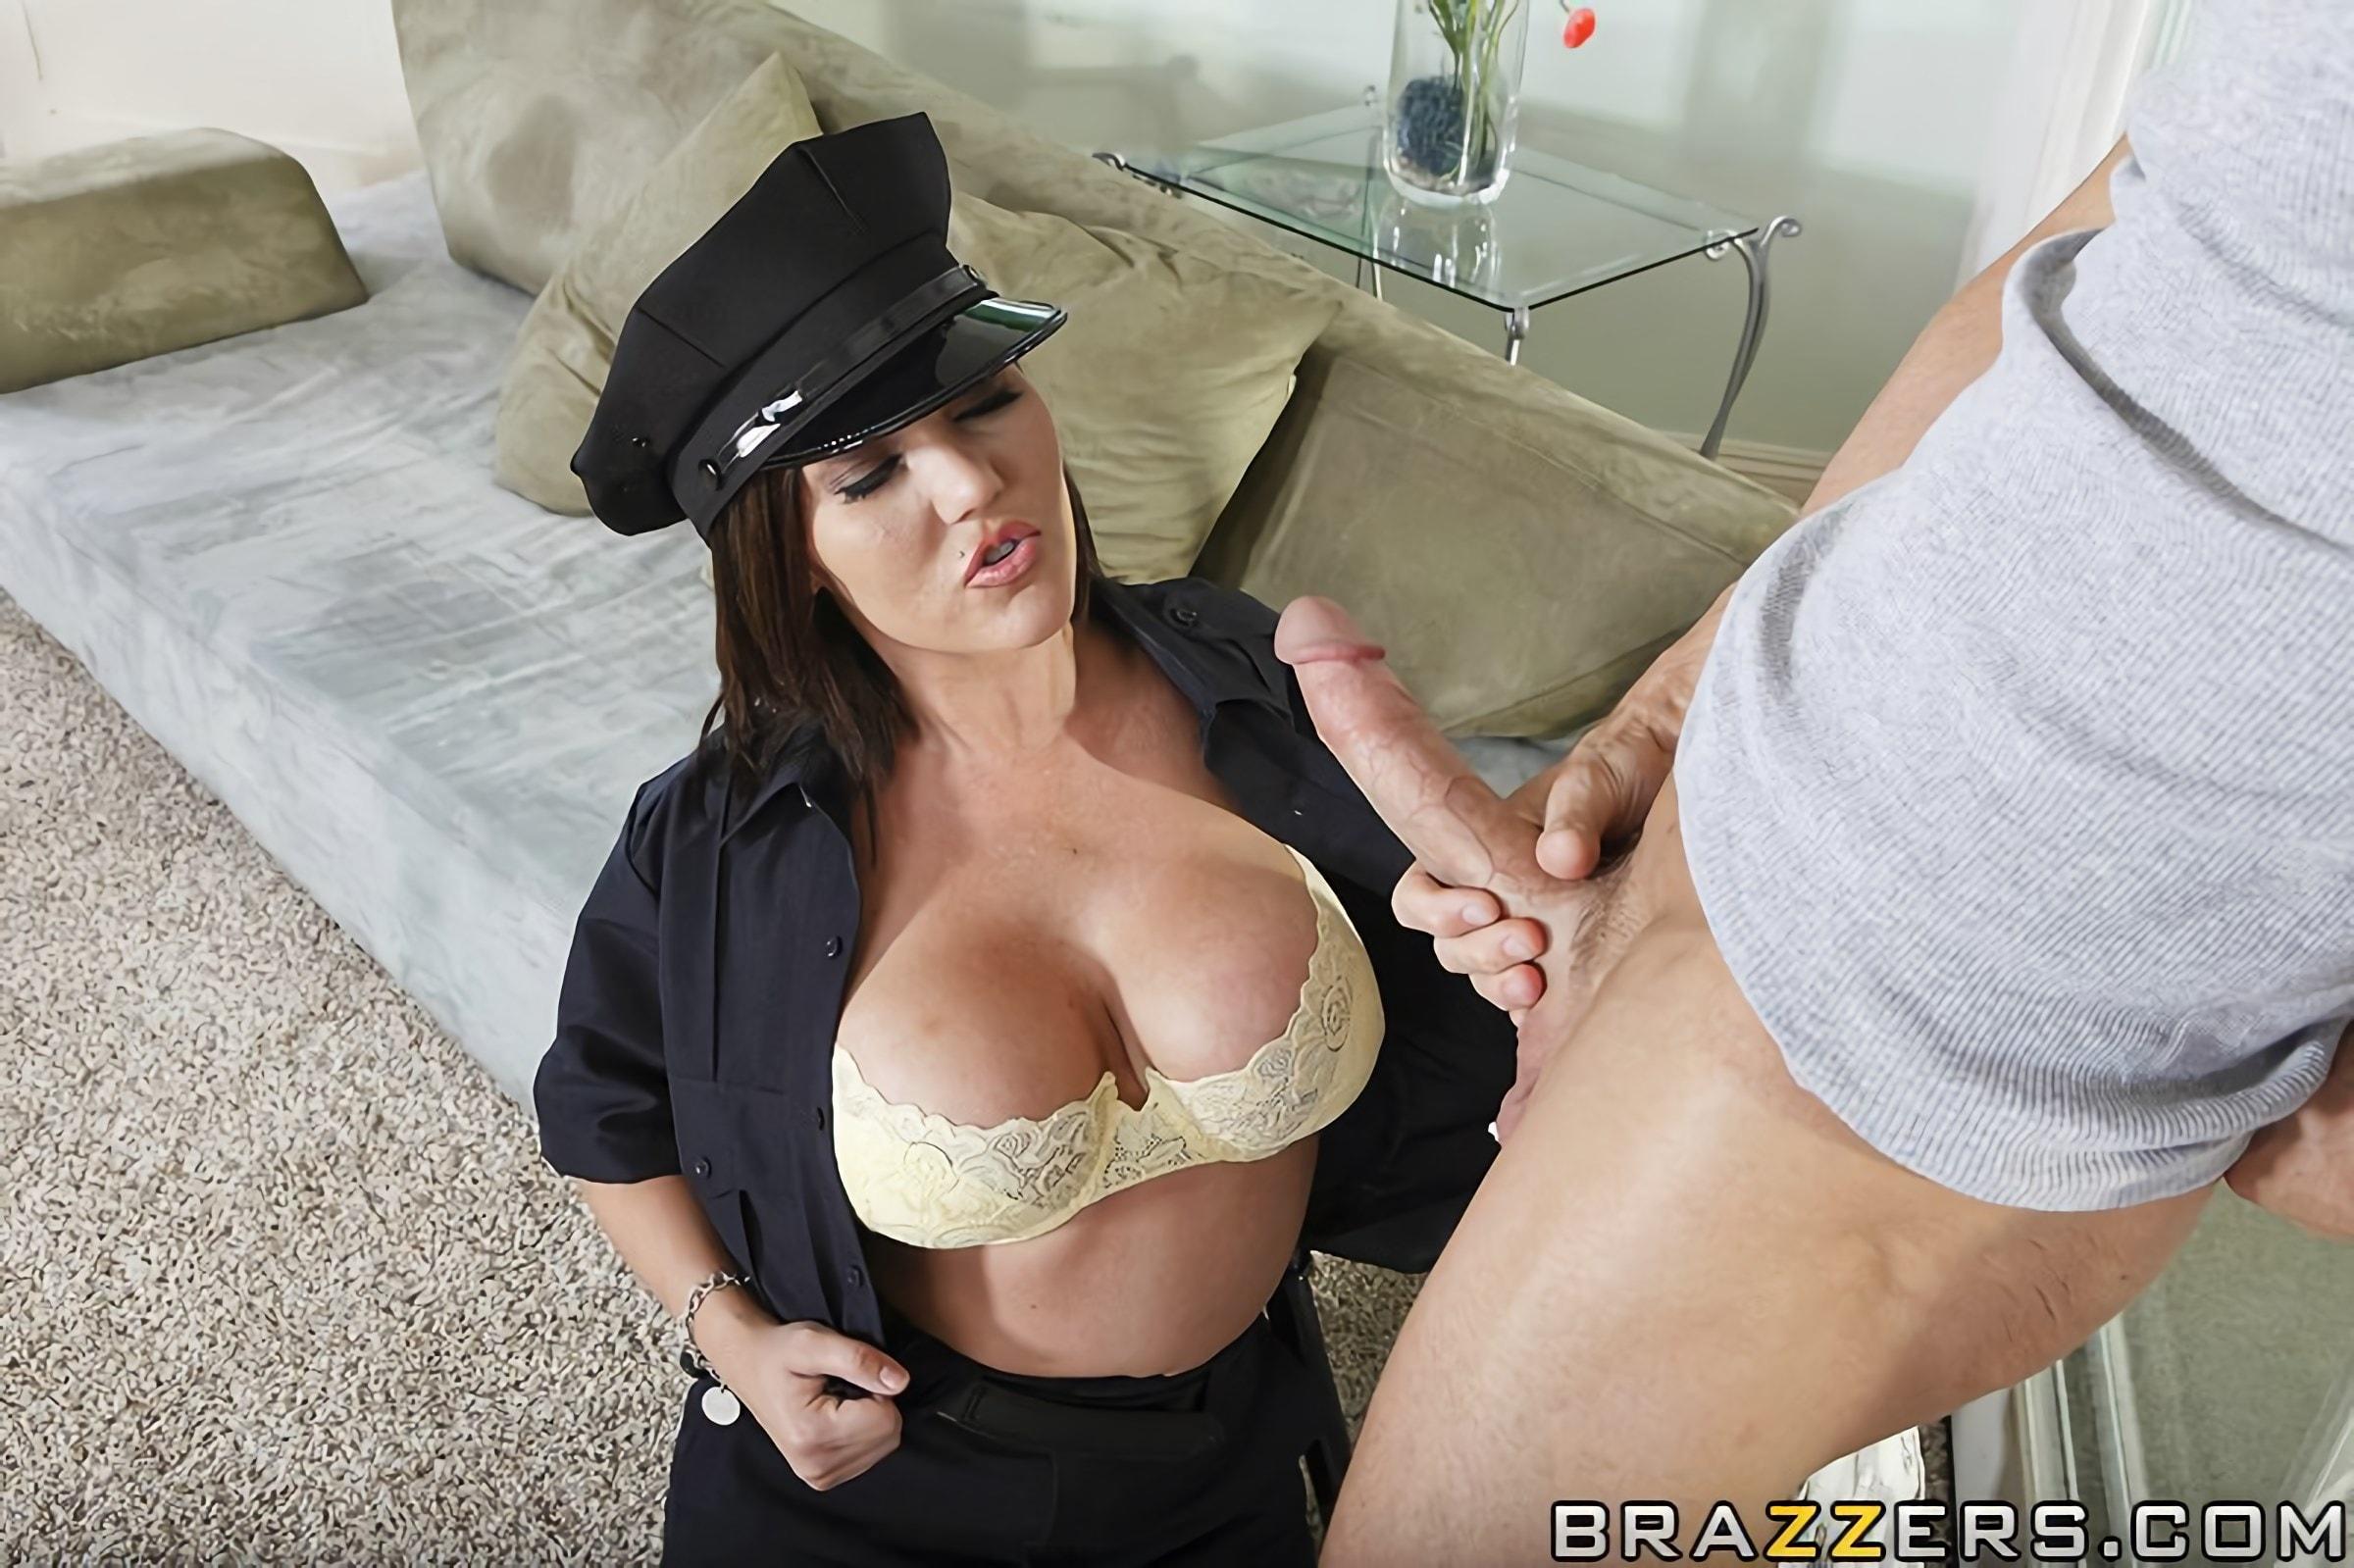 Big tits see through shirt